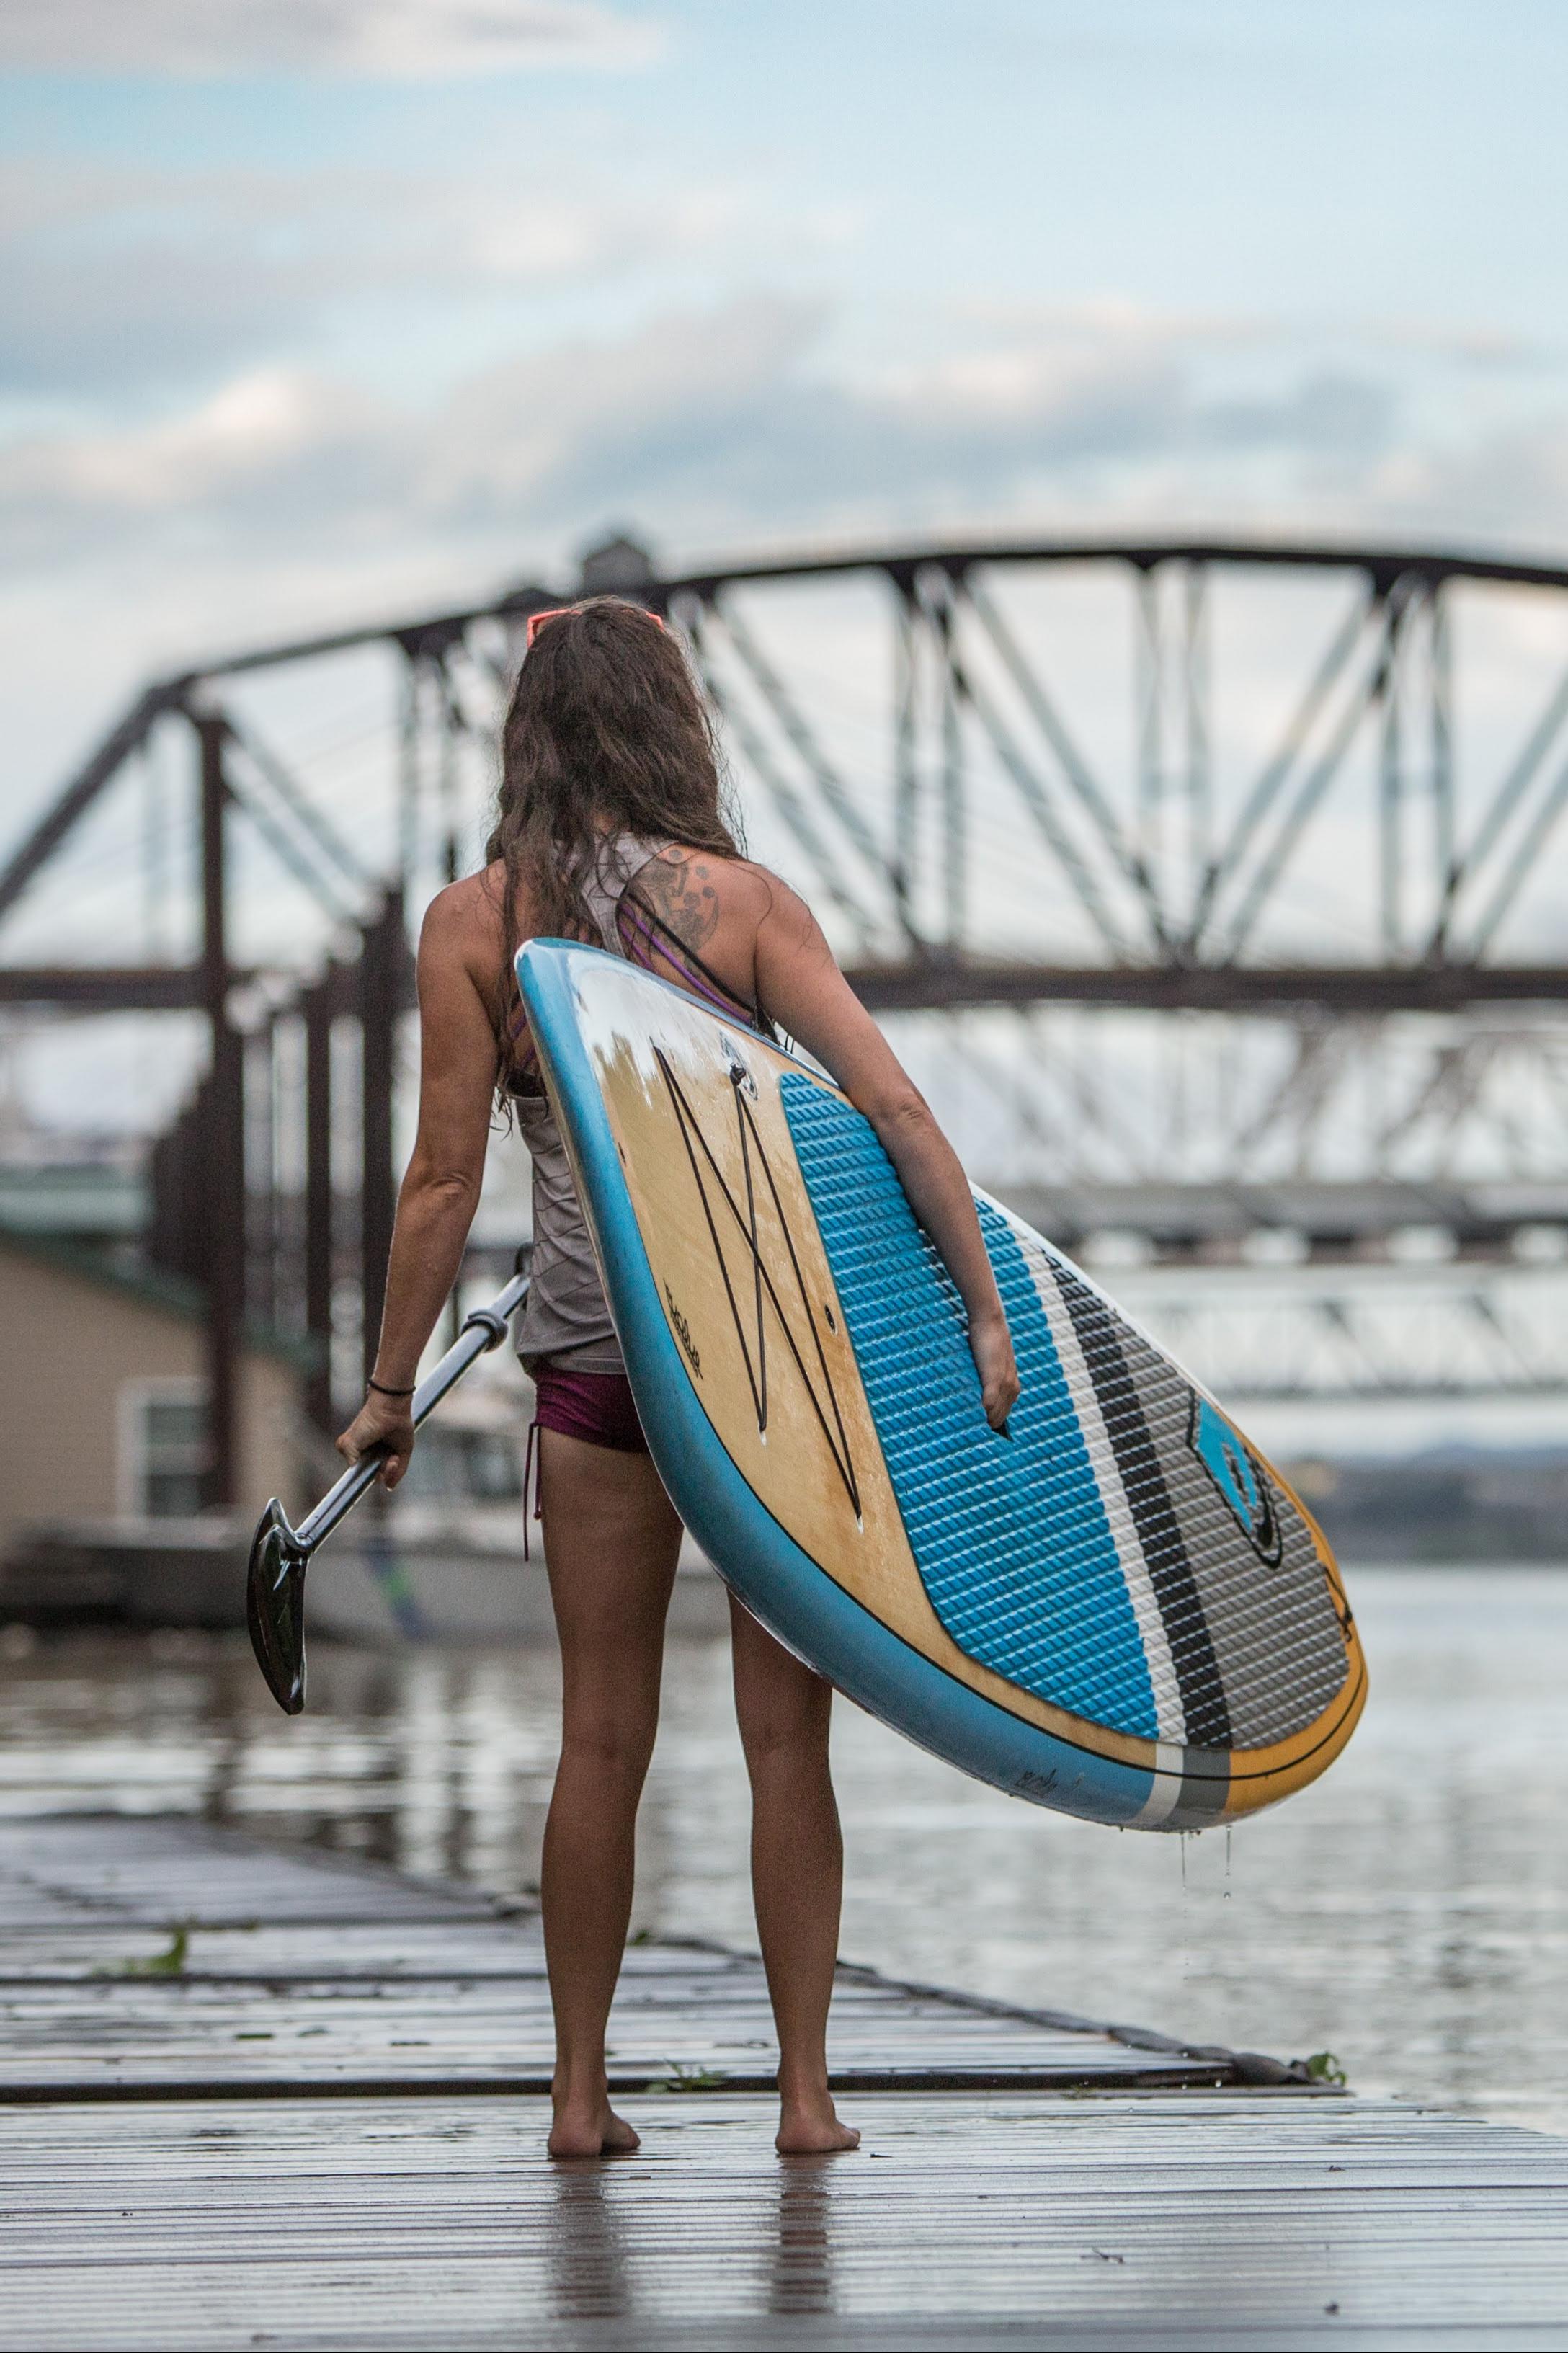 The Bridges of the Ohio River!